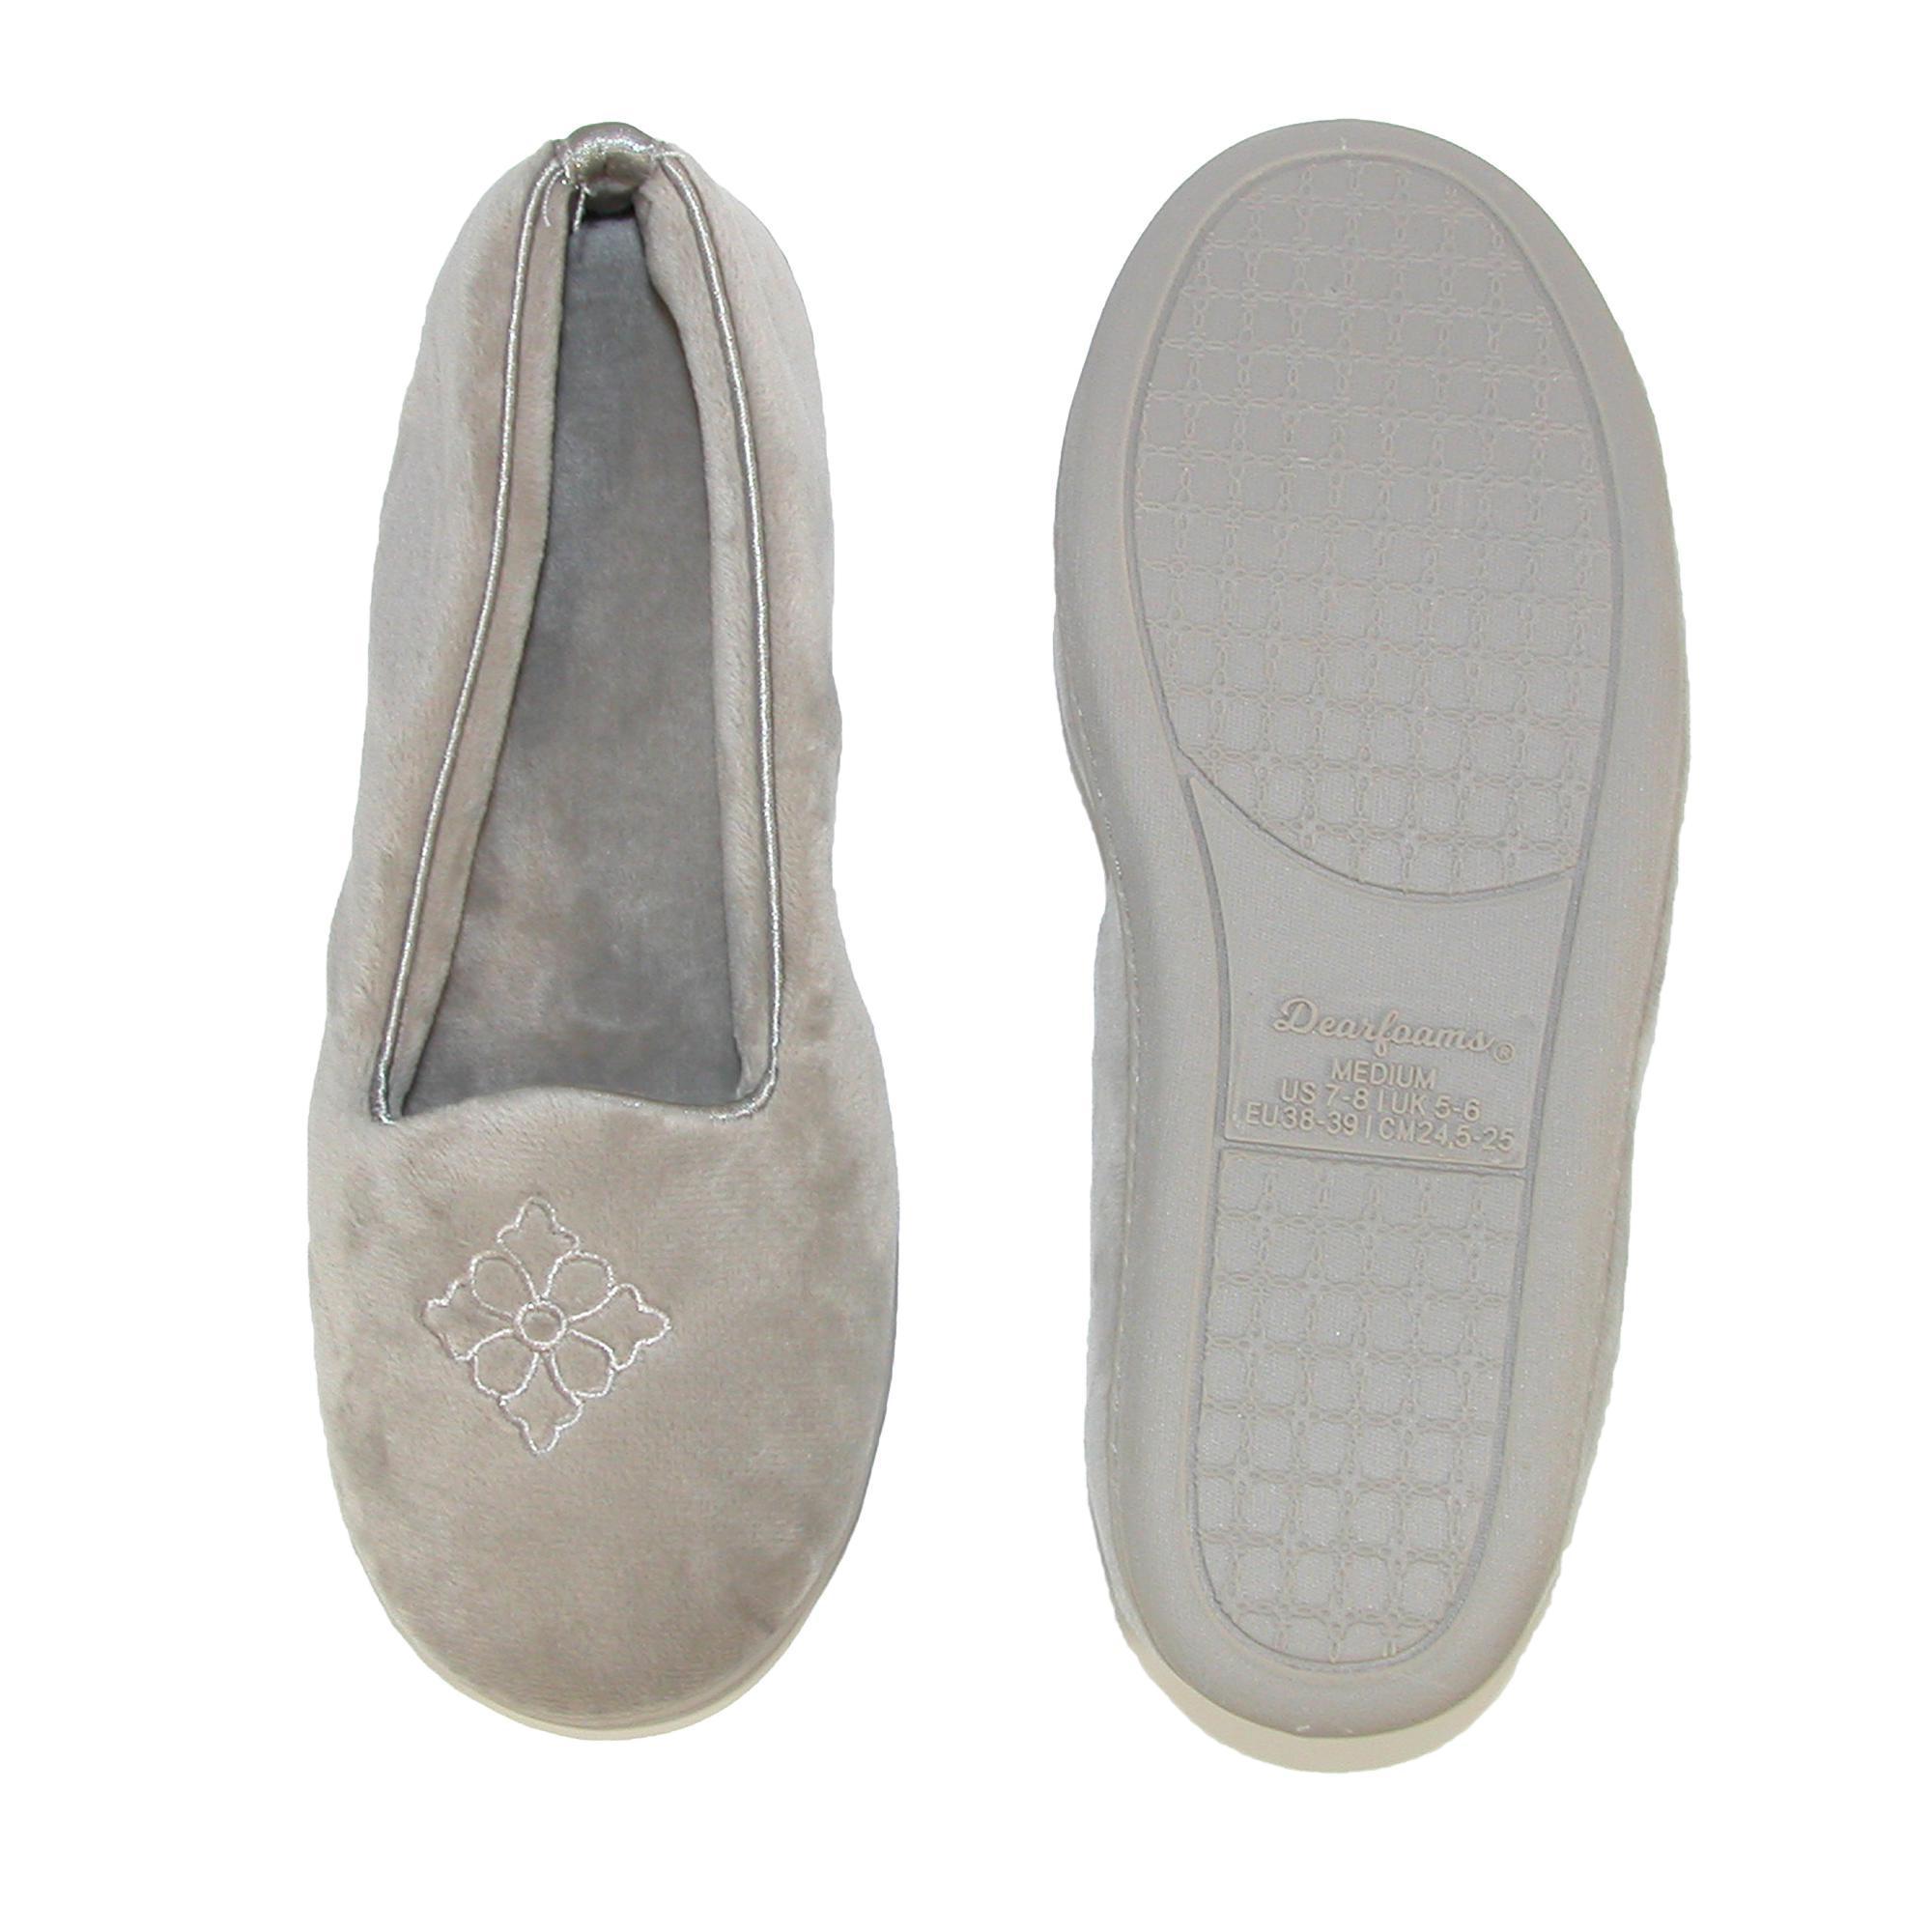 New-Dearfoams-Women-039-s-Microfiber-Velour-Closed-Back-Slippers thumbnail 12